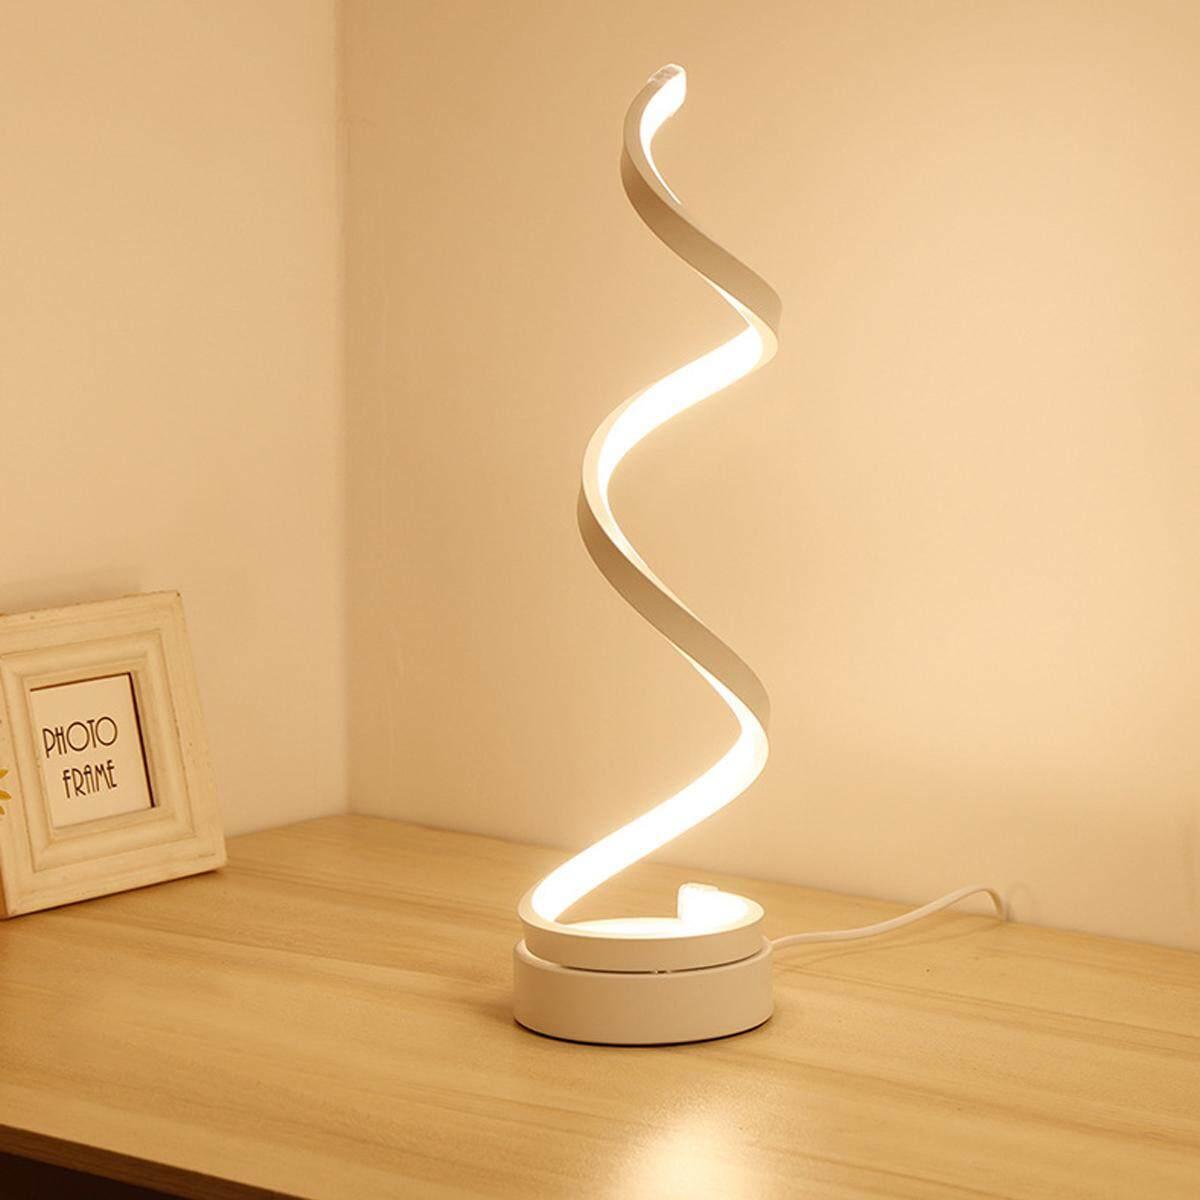 Spiral Modern LED Table Lamp 24w Warm White Decorative Bedroom Light Golden [White - Warm Light (US Regulations)]